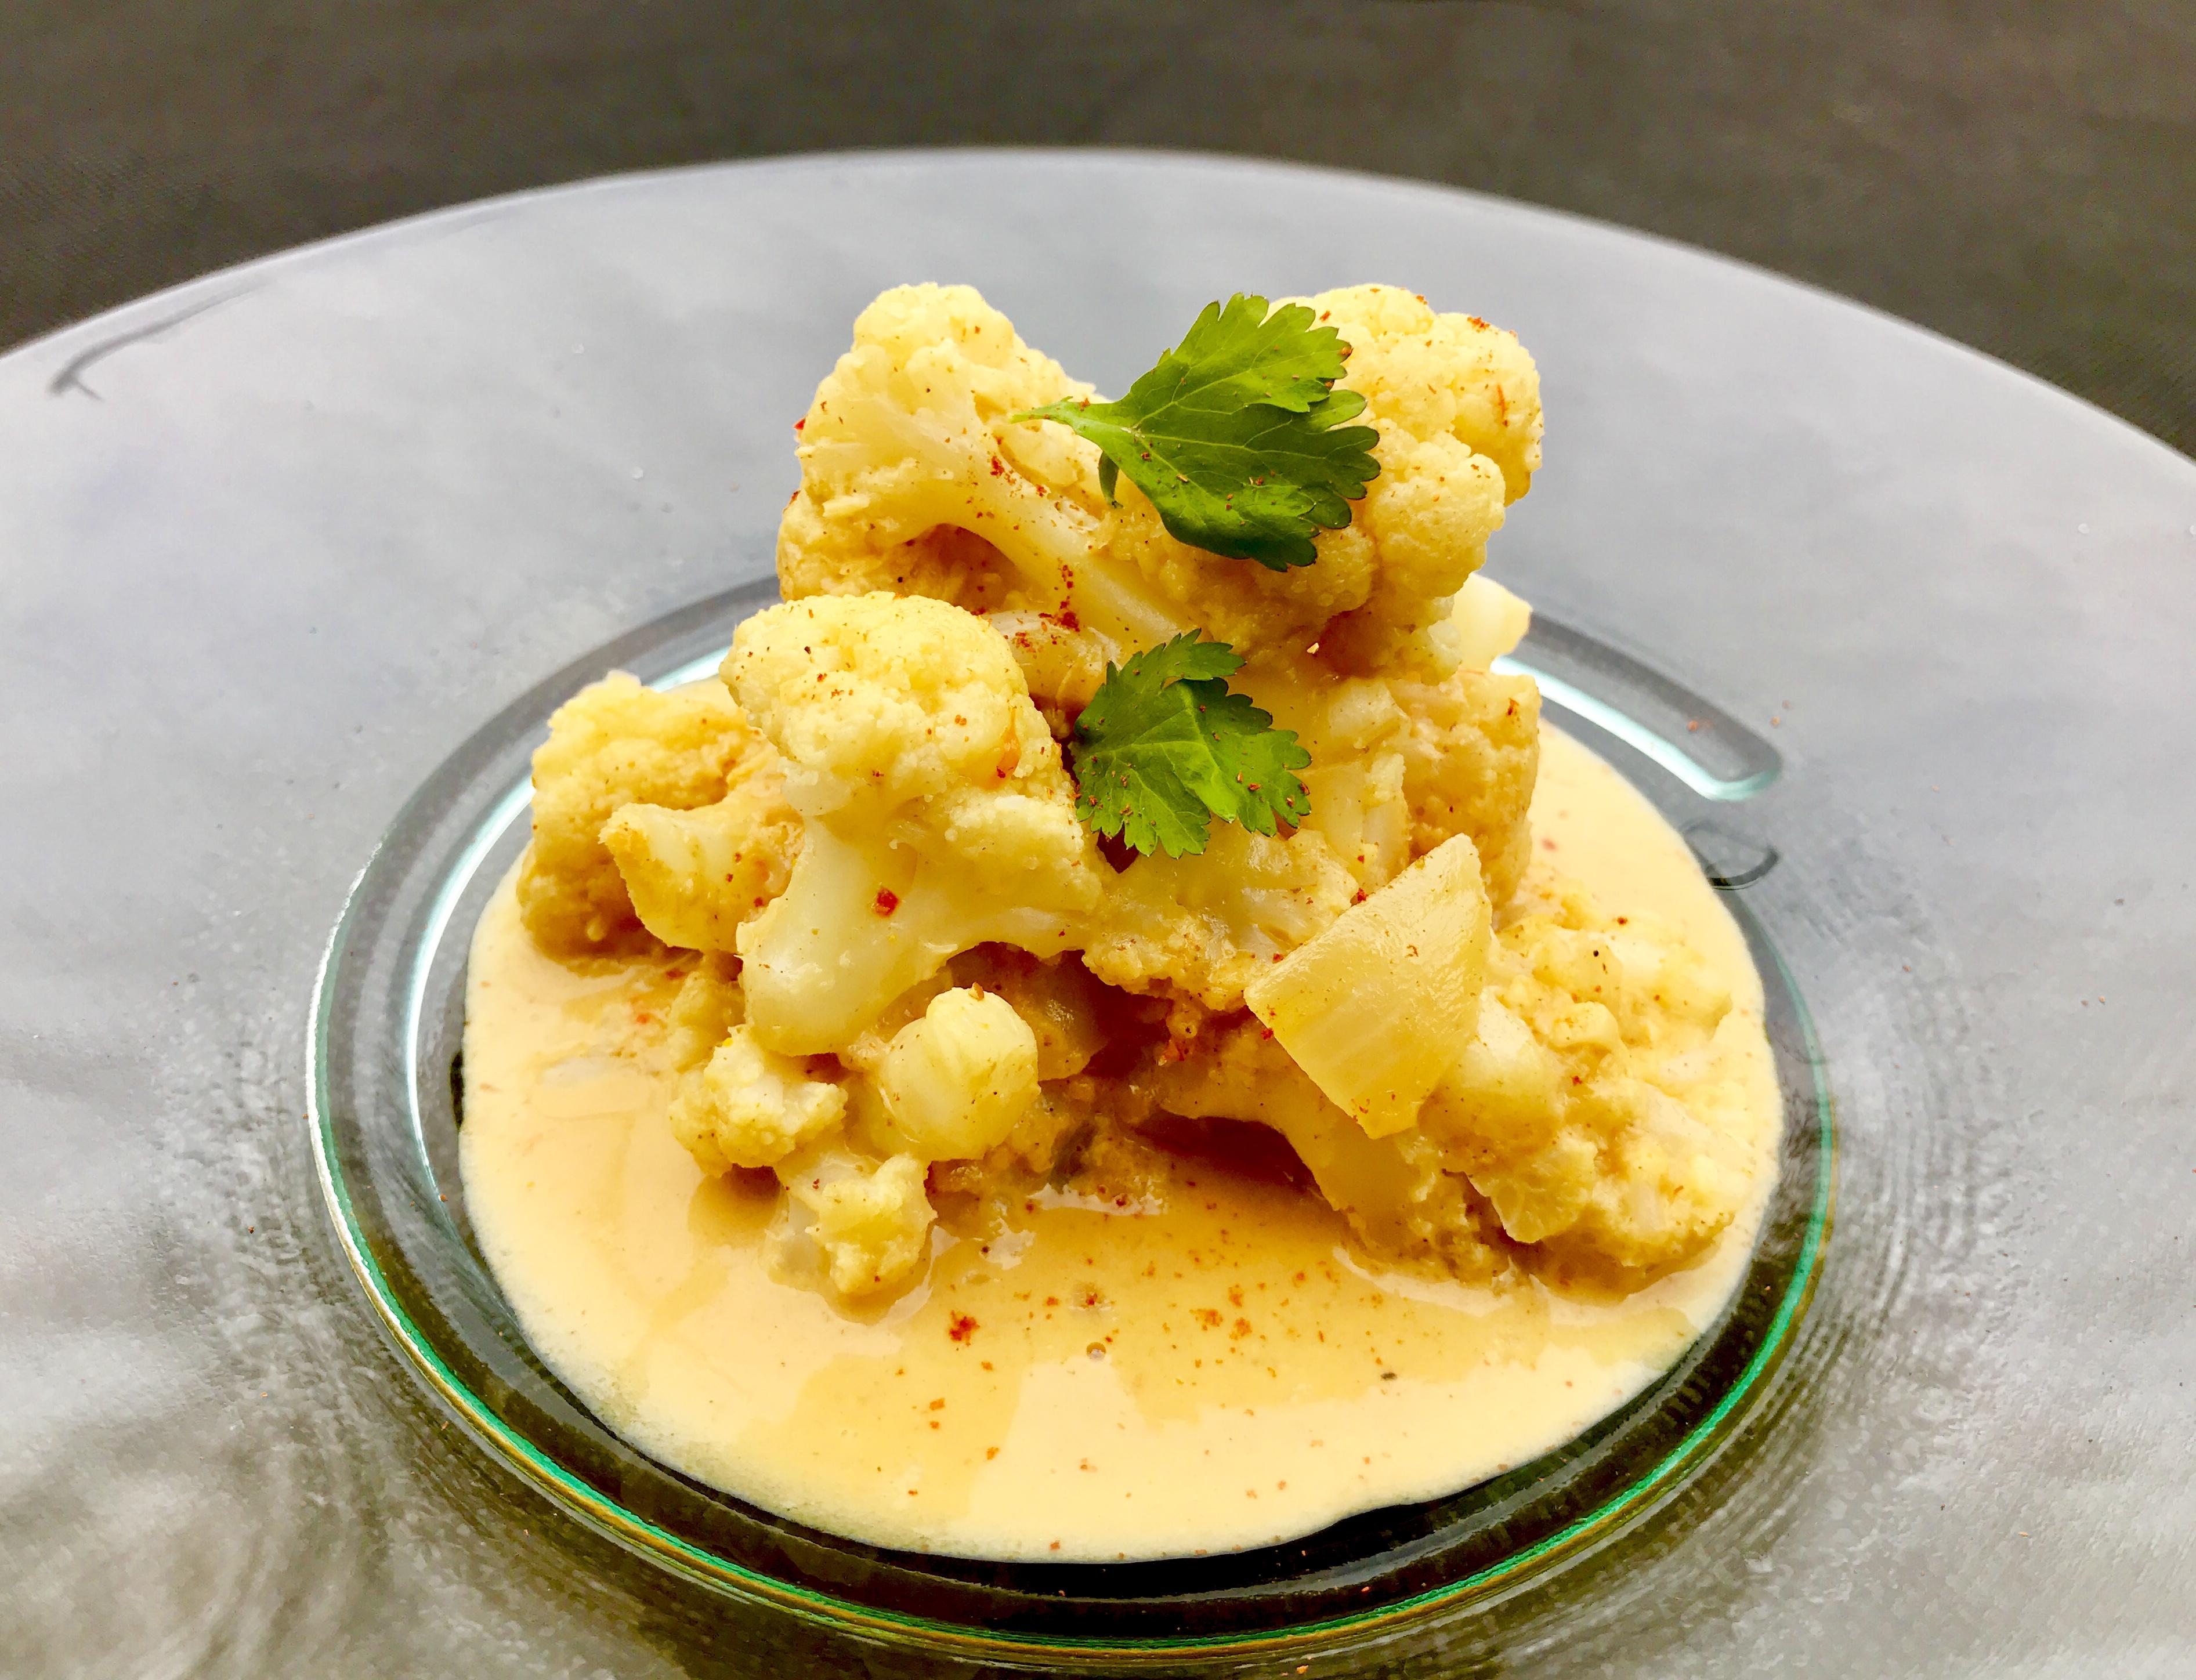 Vegan cauliflower curry delicious vegan thai food recipes vegan cauliflower curry easy thai recipes forumfinder Choice Image